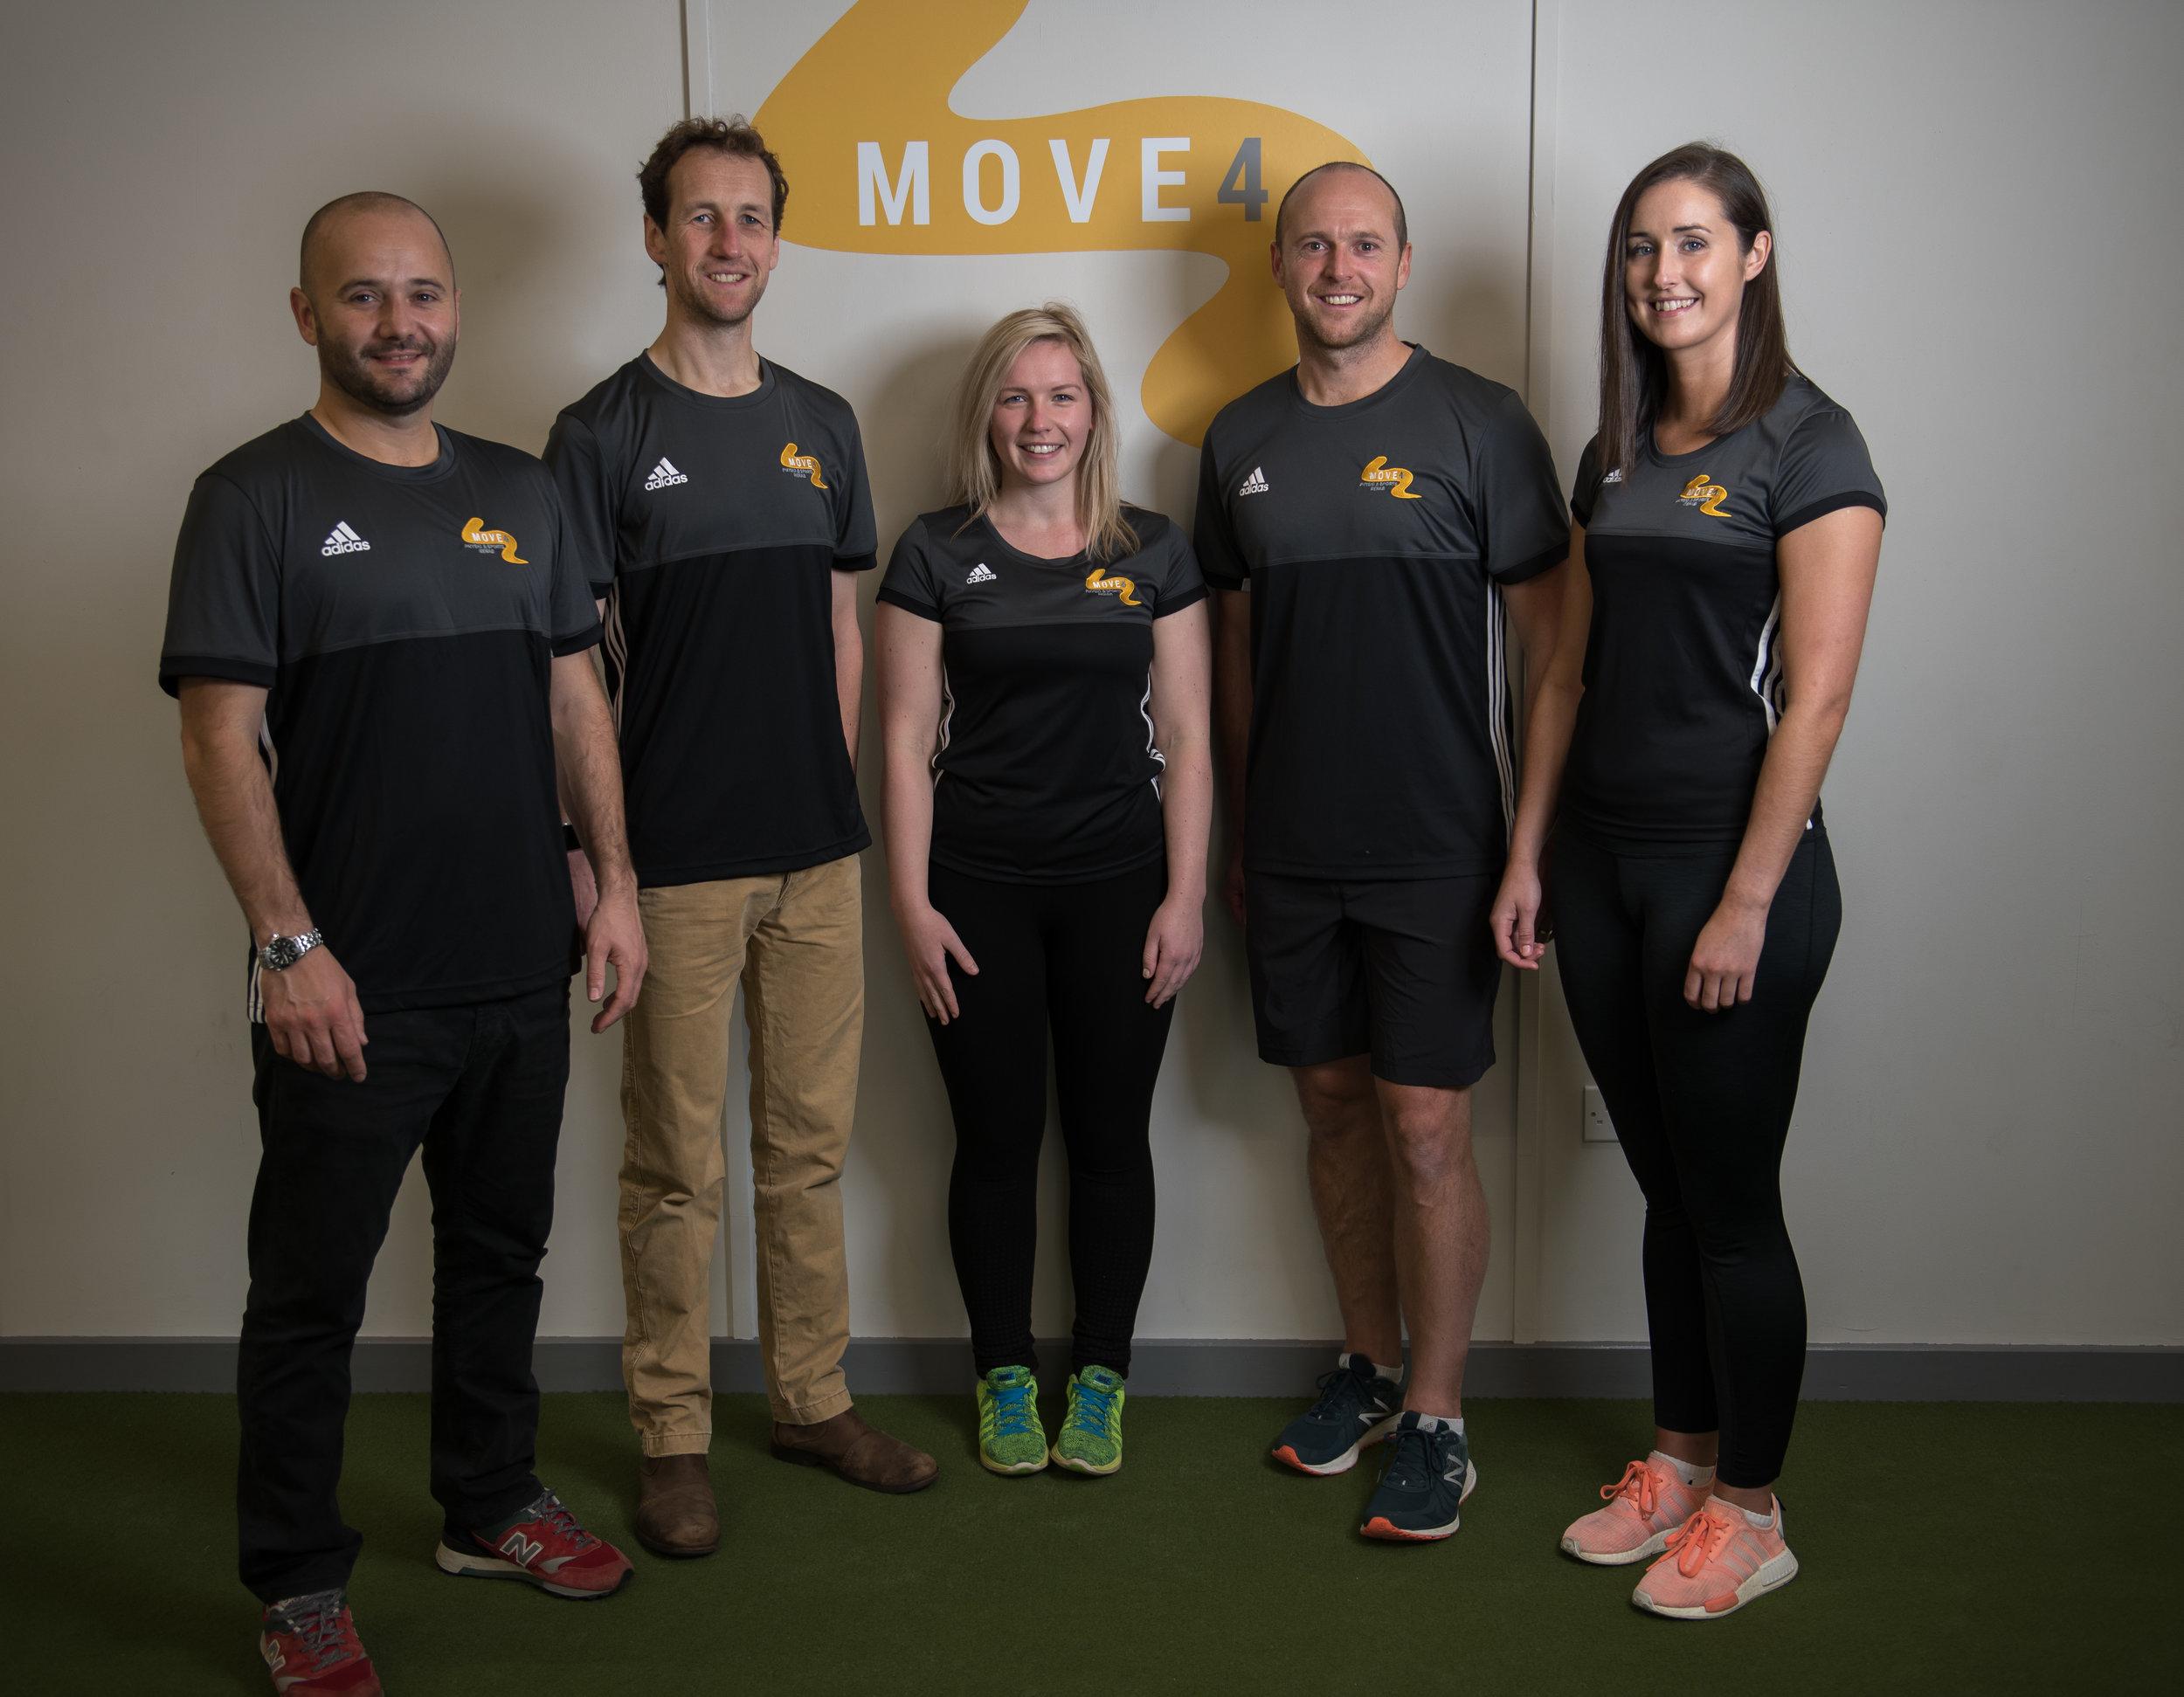 The Move4 Physio Northampton Team